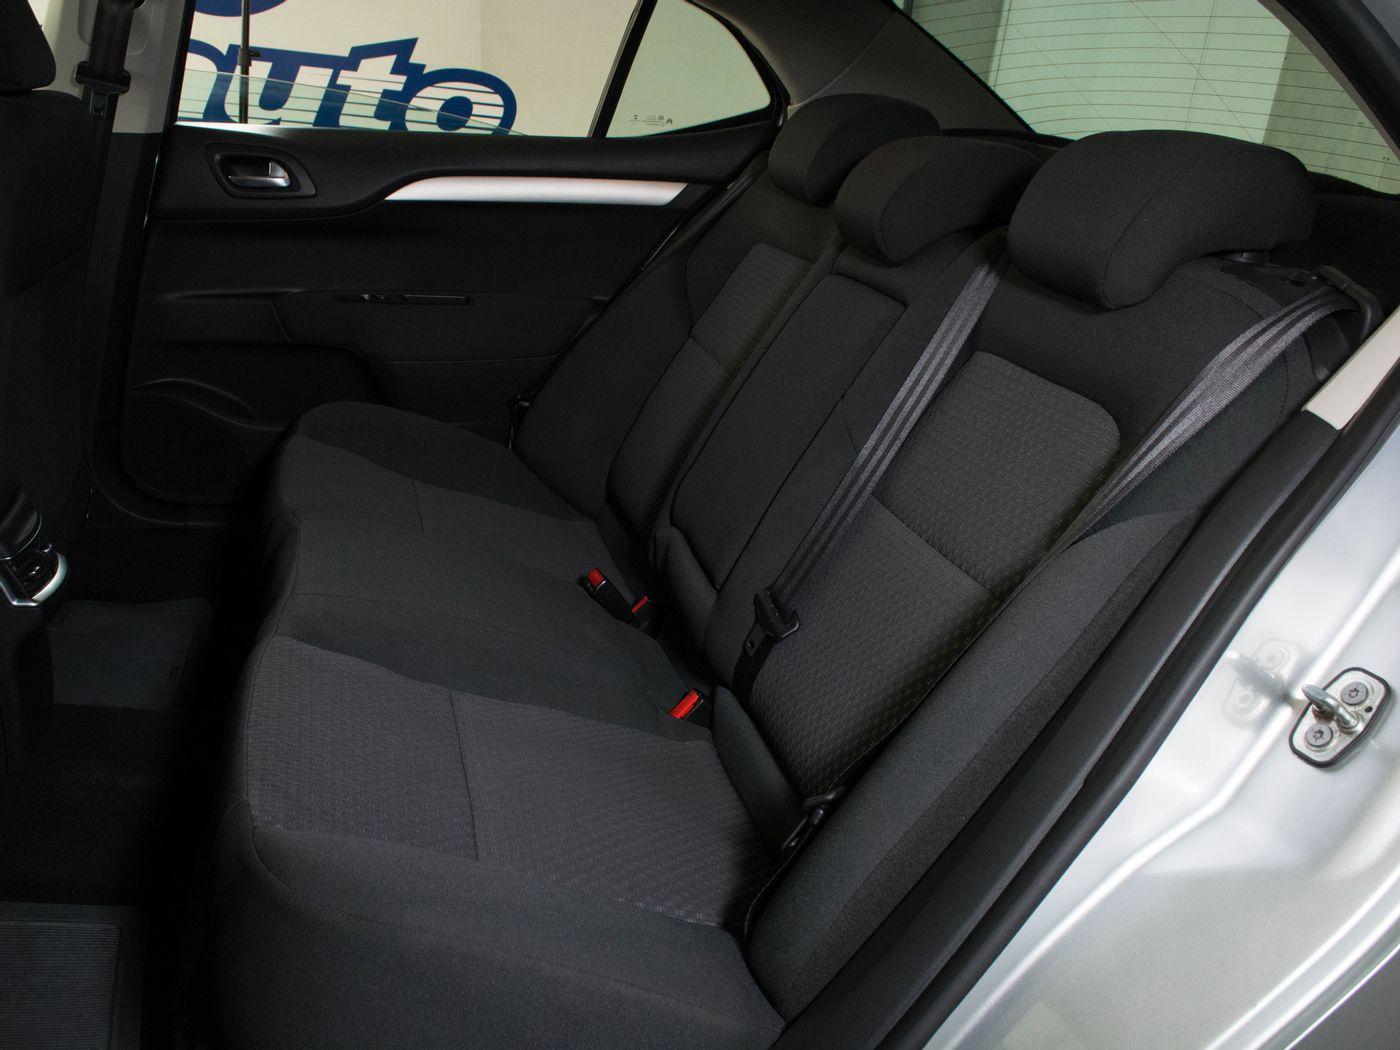 Citroën C4 LOUNGE Origine 1.6 Turbo Flex  Aut.